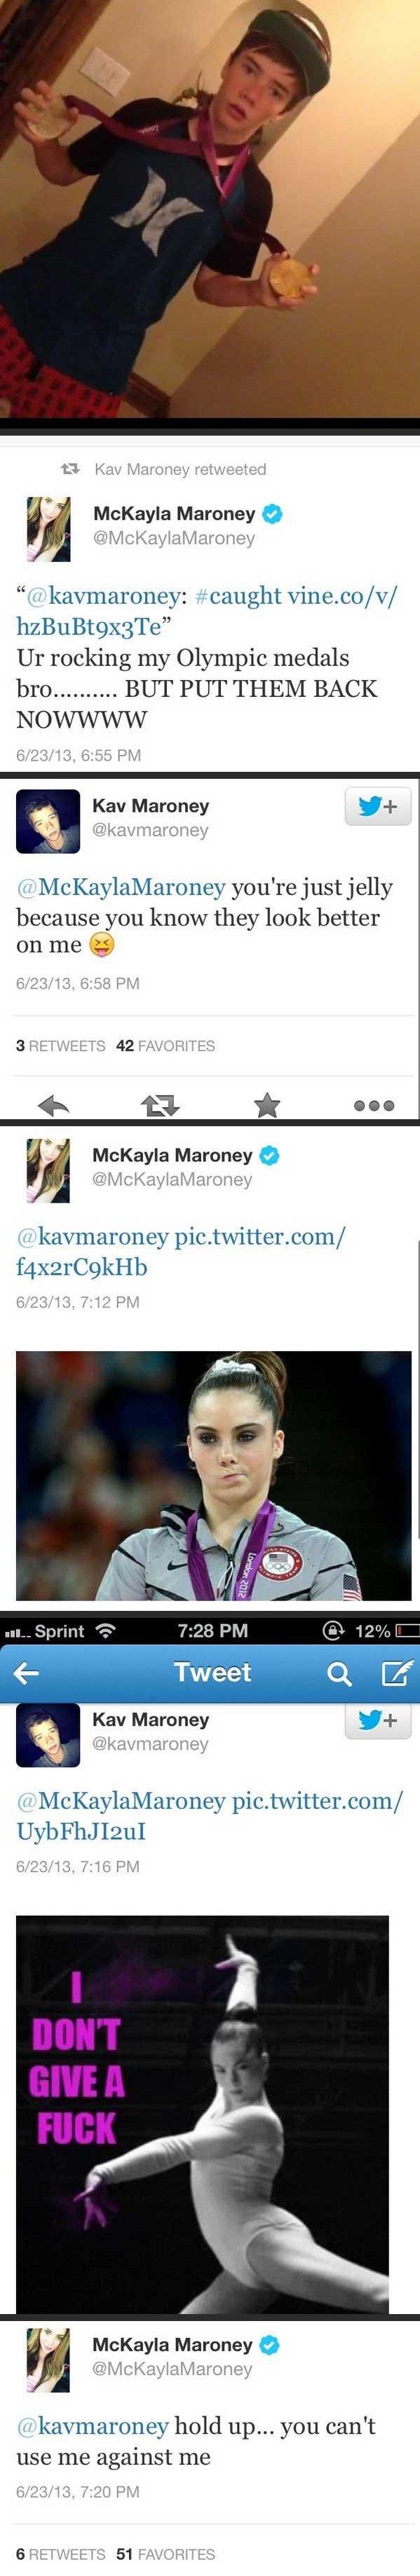 Maroney family. . it Nav Maroney retweeted 3- Mckayla Maroney O Ix : T caught vine. co/ v/ Ur rocking my Olympic medals NOWNOW Kav Maroney .- oi you' re just je Maroney family it Nav retweeted 3- Mckayla O Ix : T caught vine co/ v/ Ur rocking my Olympic medals NOWNOW Kav - oi you' re just je